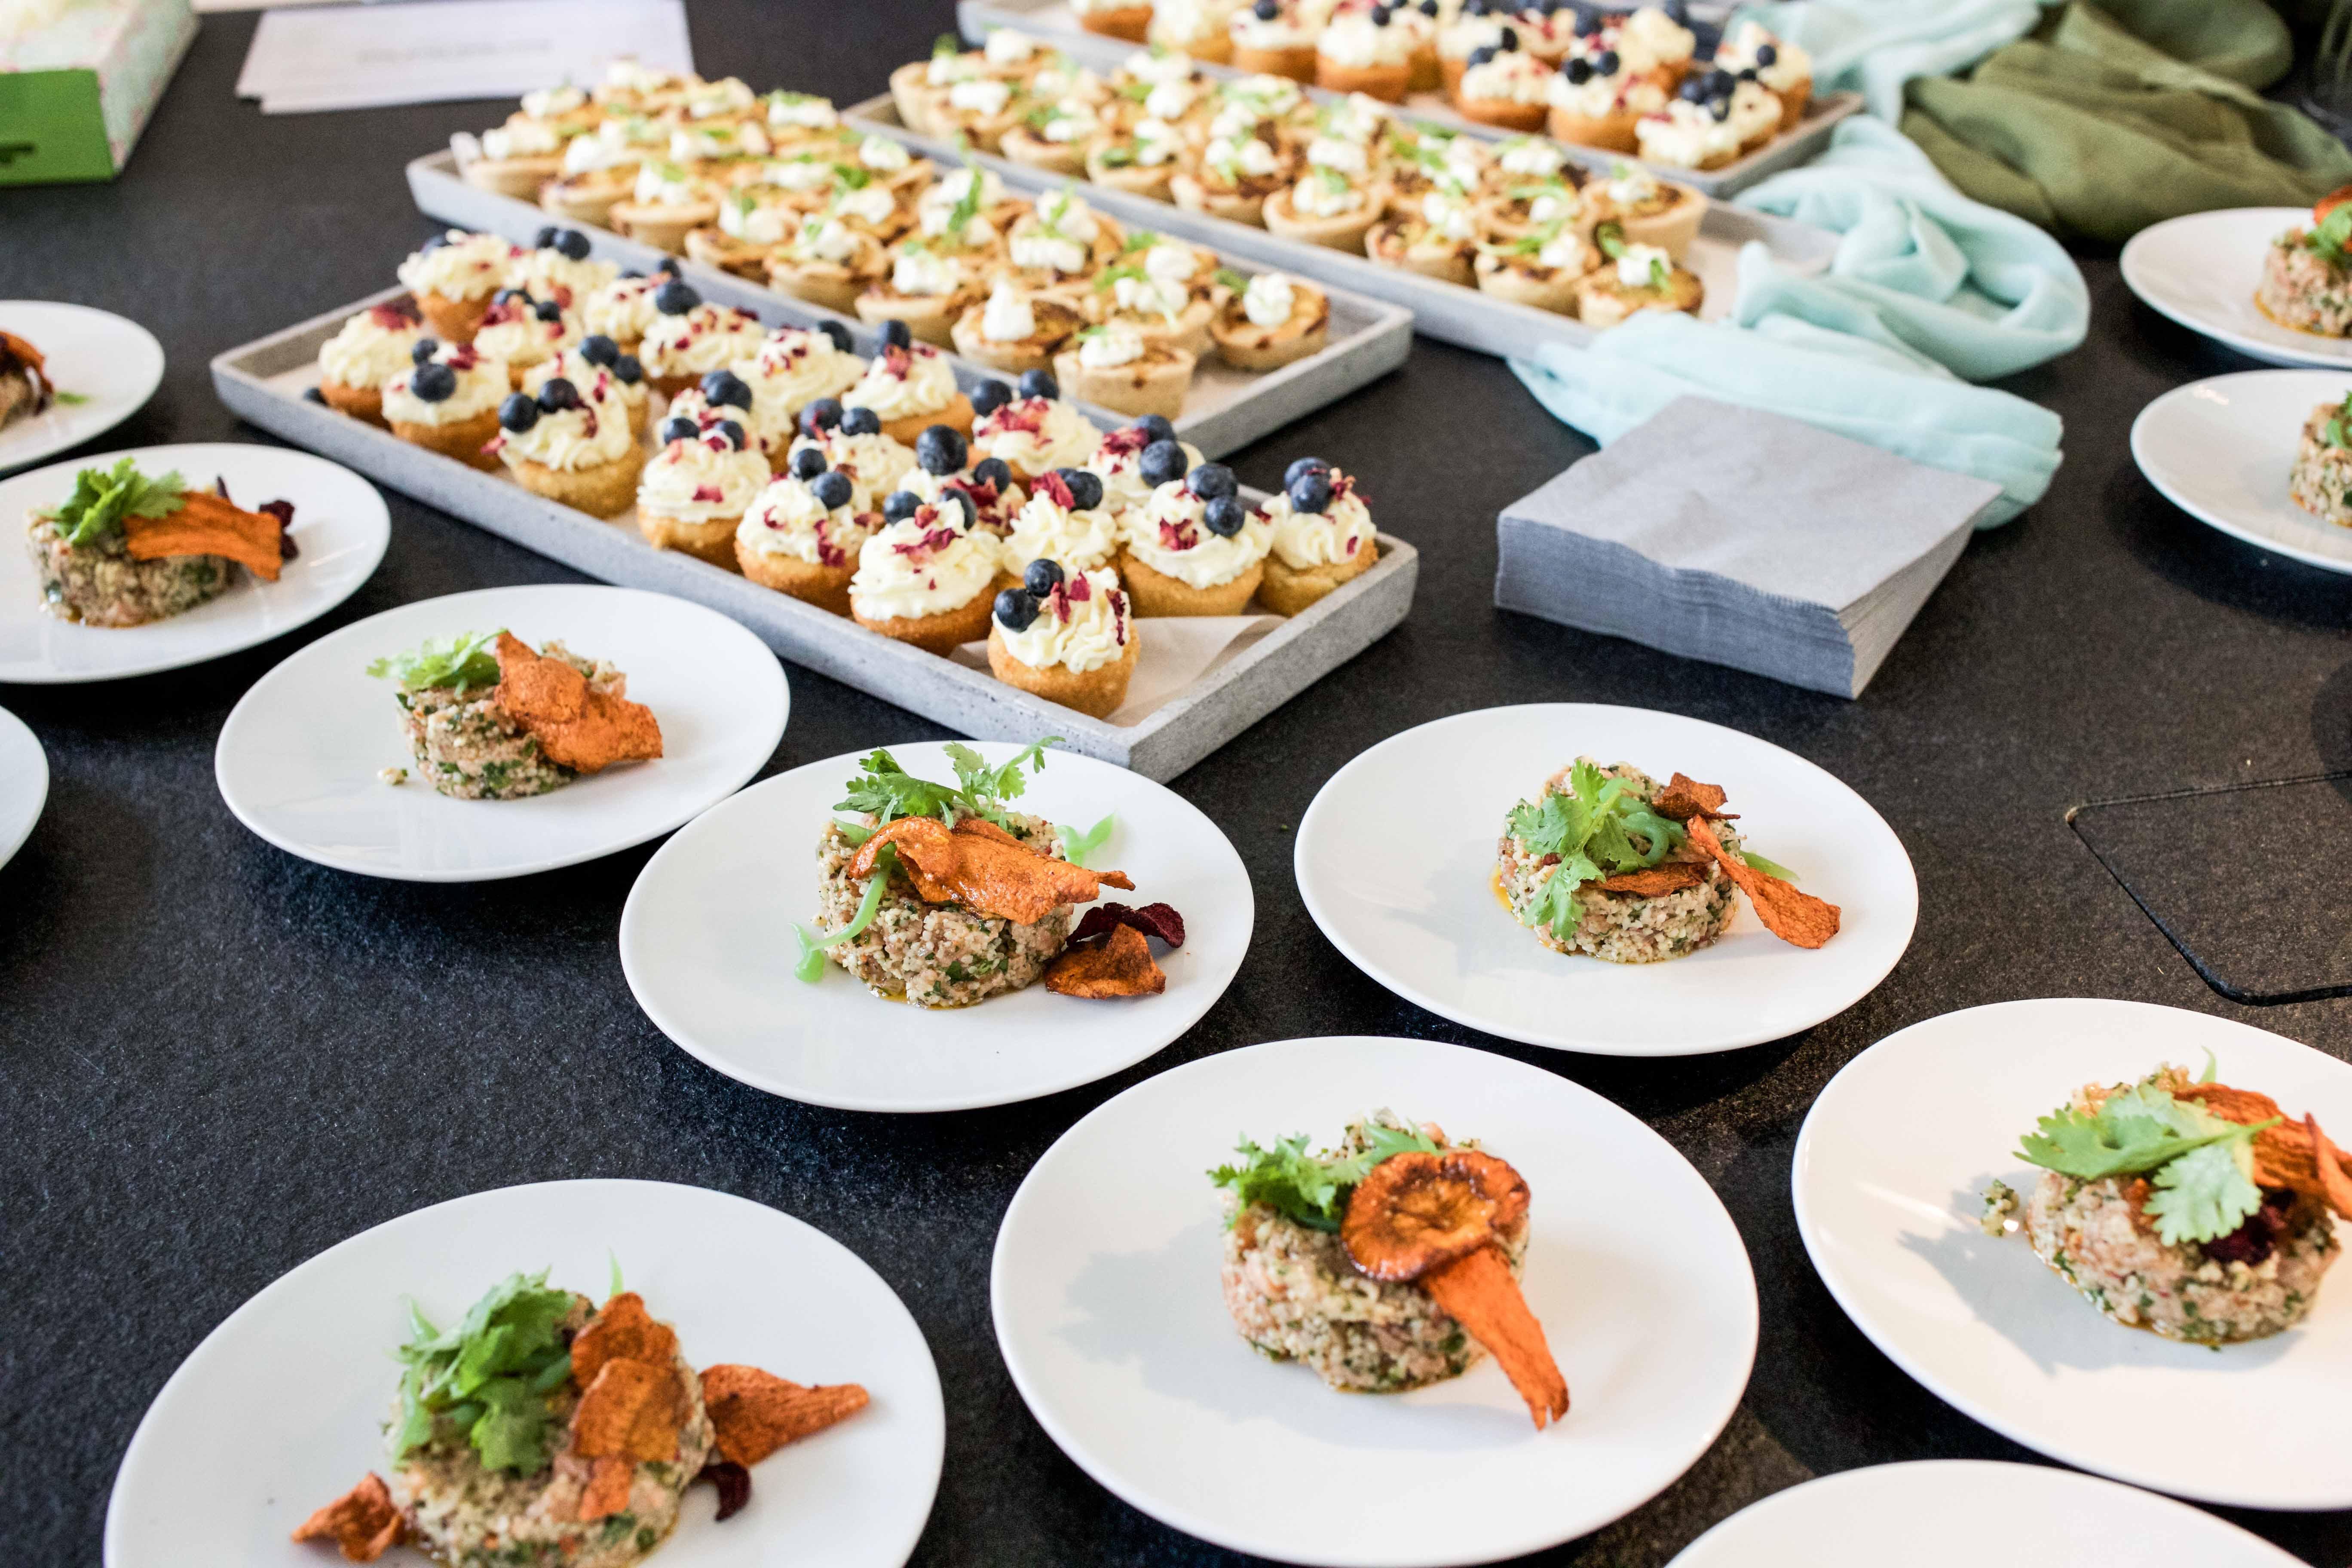 herta-finesse-workshop-berlin-sandwich-makeover-mittagspause-lunch-rezept-rezeptideen_5922